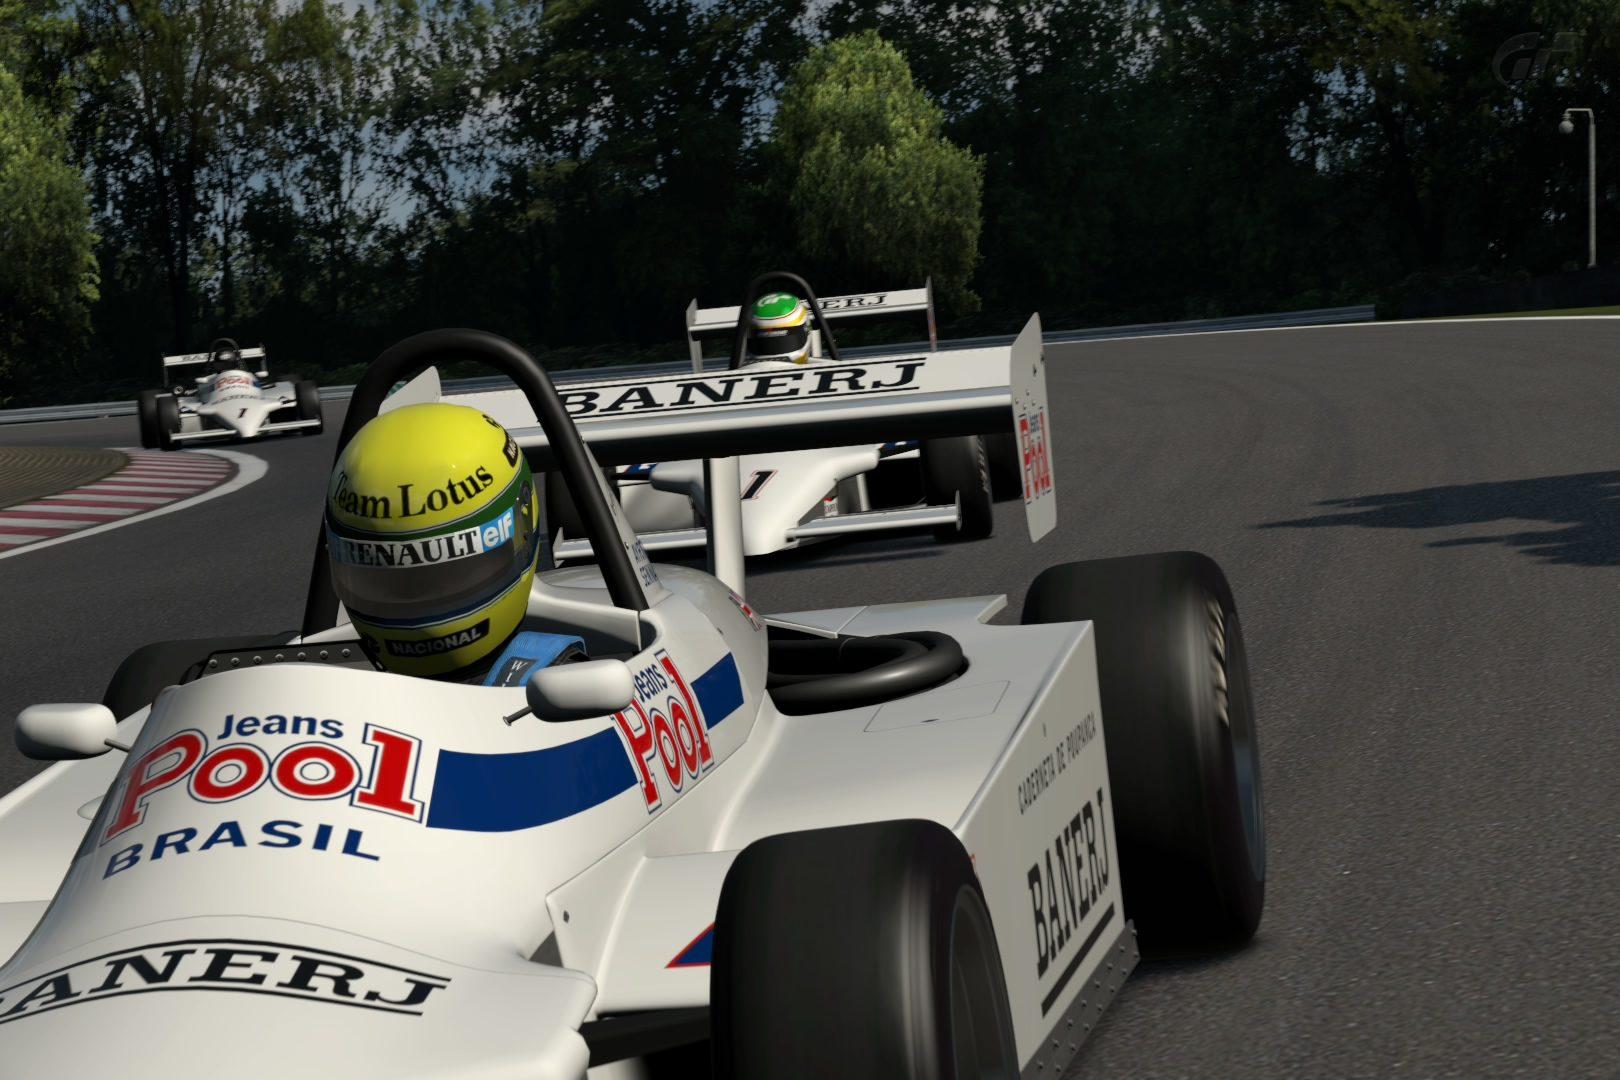 Brands Hatch Grand Prix Circuit '80s_21.jpg